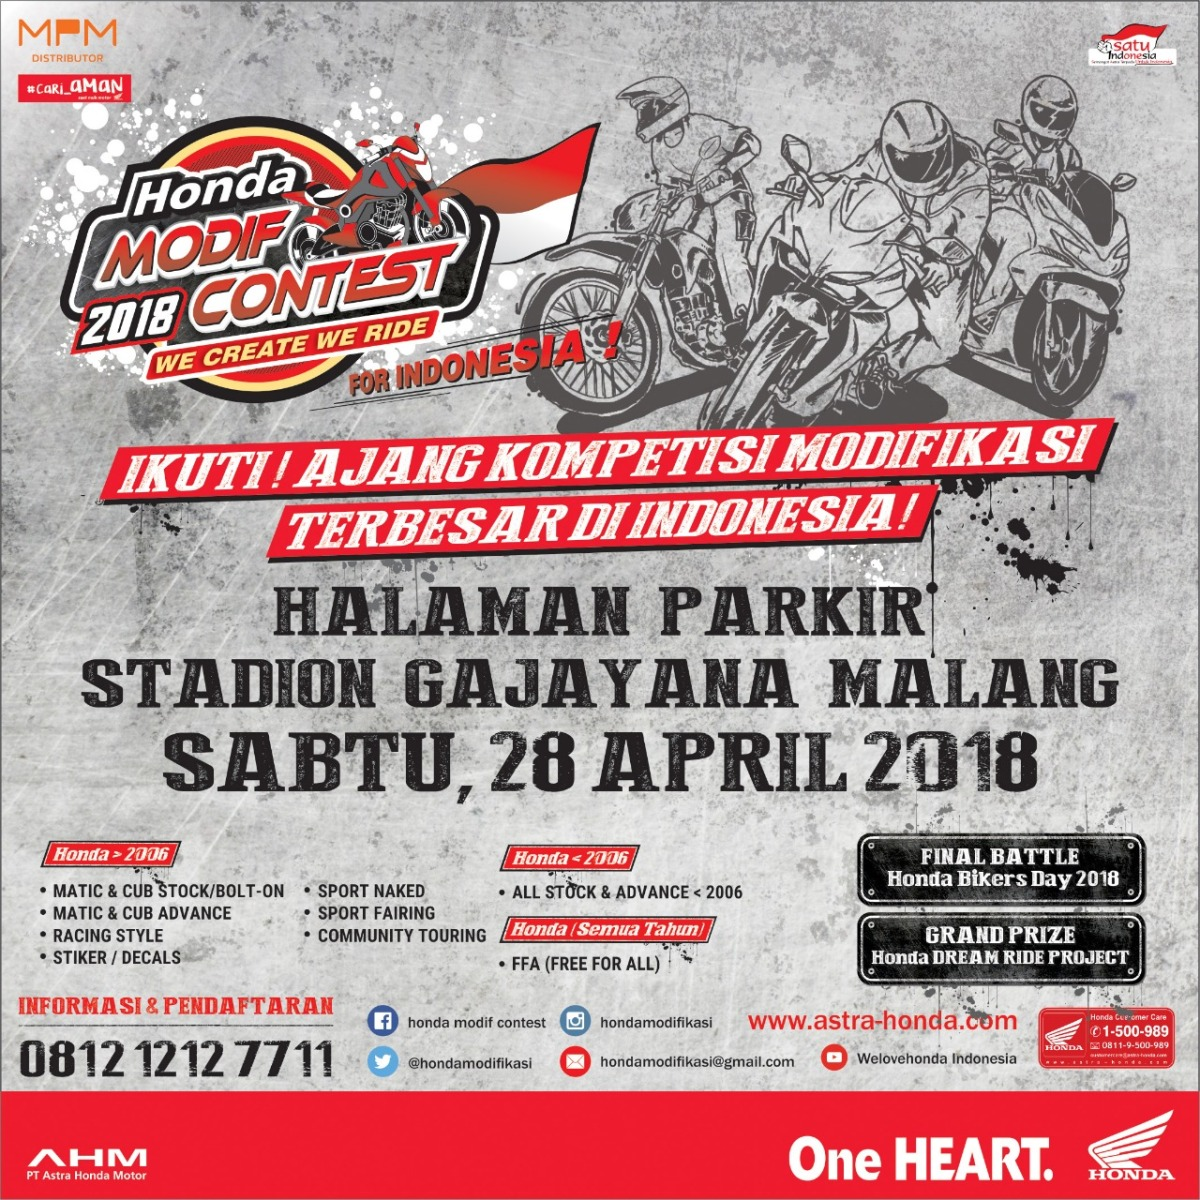 Honda Modif 2018 Contest, Kompetisi Modif Terbesar di Indonesia Bakal Digelar di Malang! Ayo, Ramaikan!